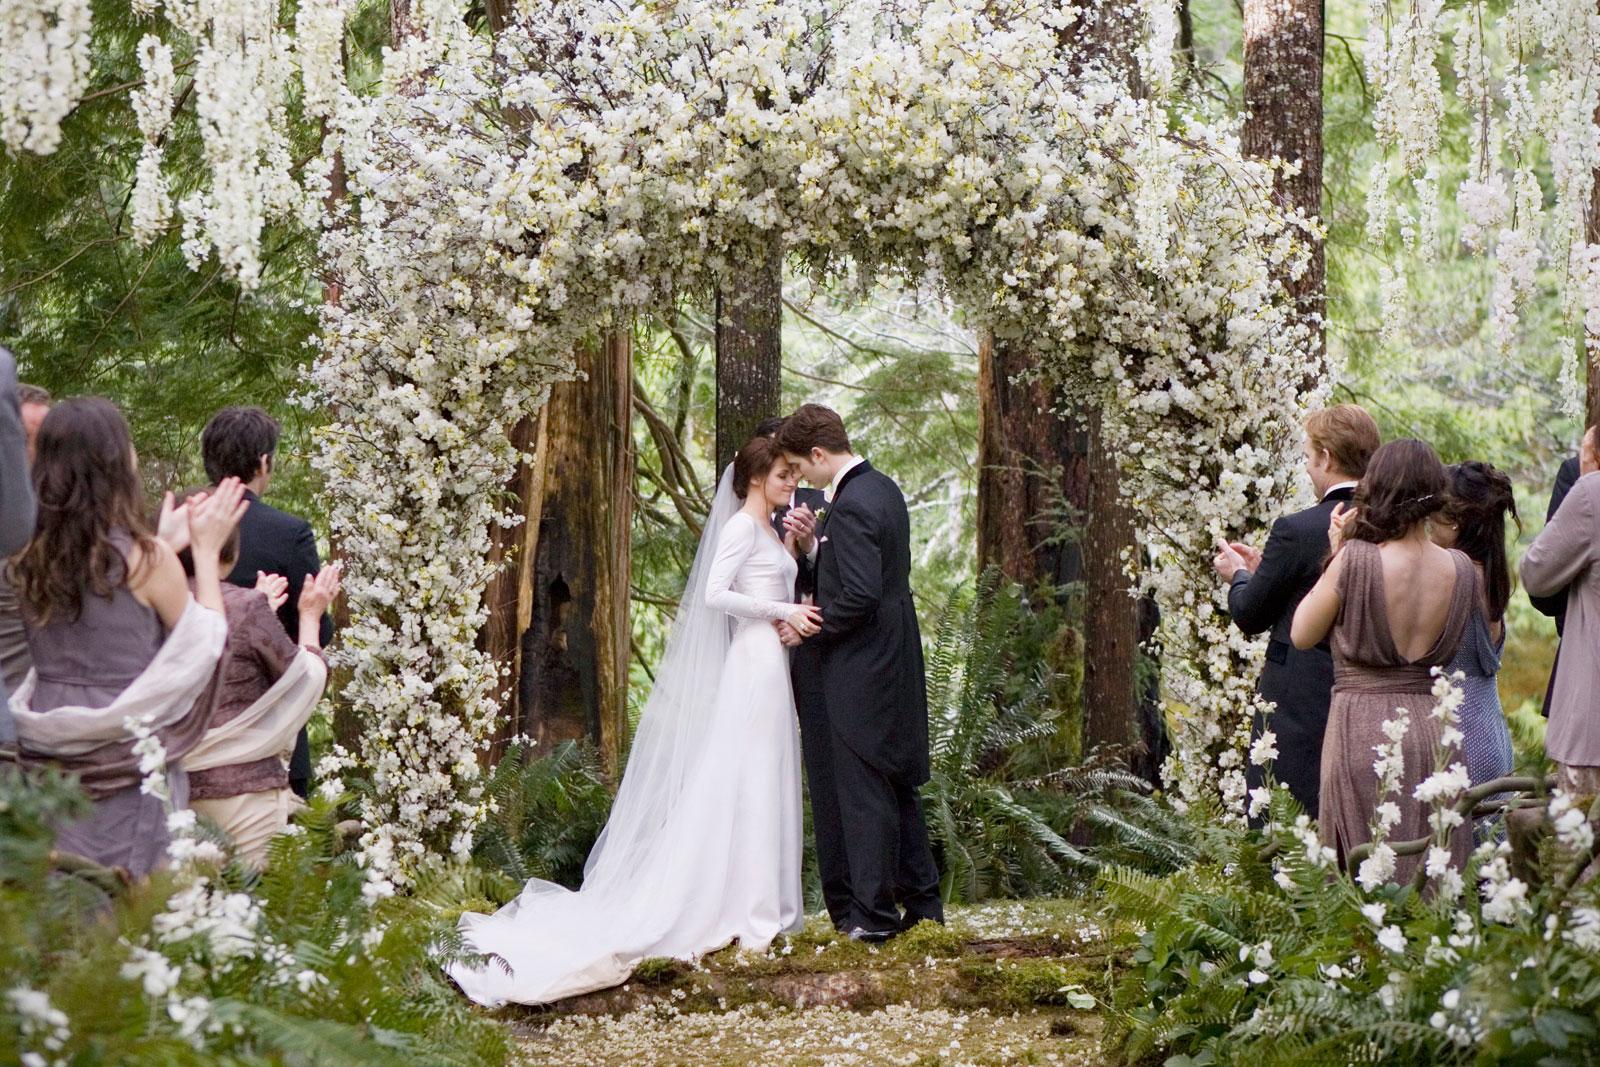 Bella Swans Twilight Wedding Dress Replica Hits Stores  eXtravaganzi